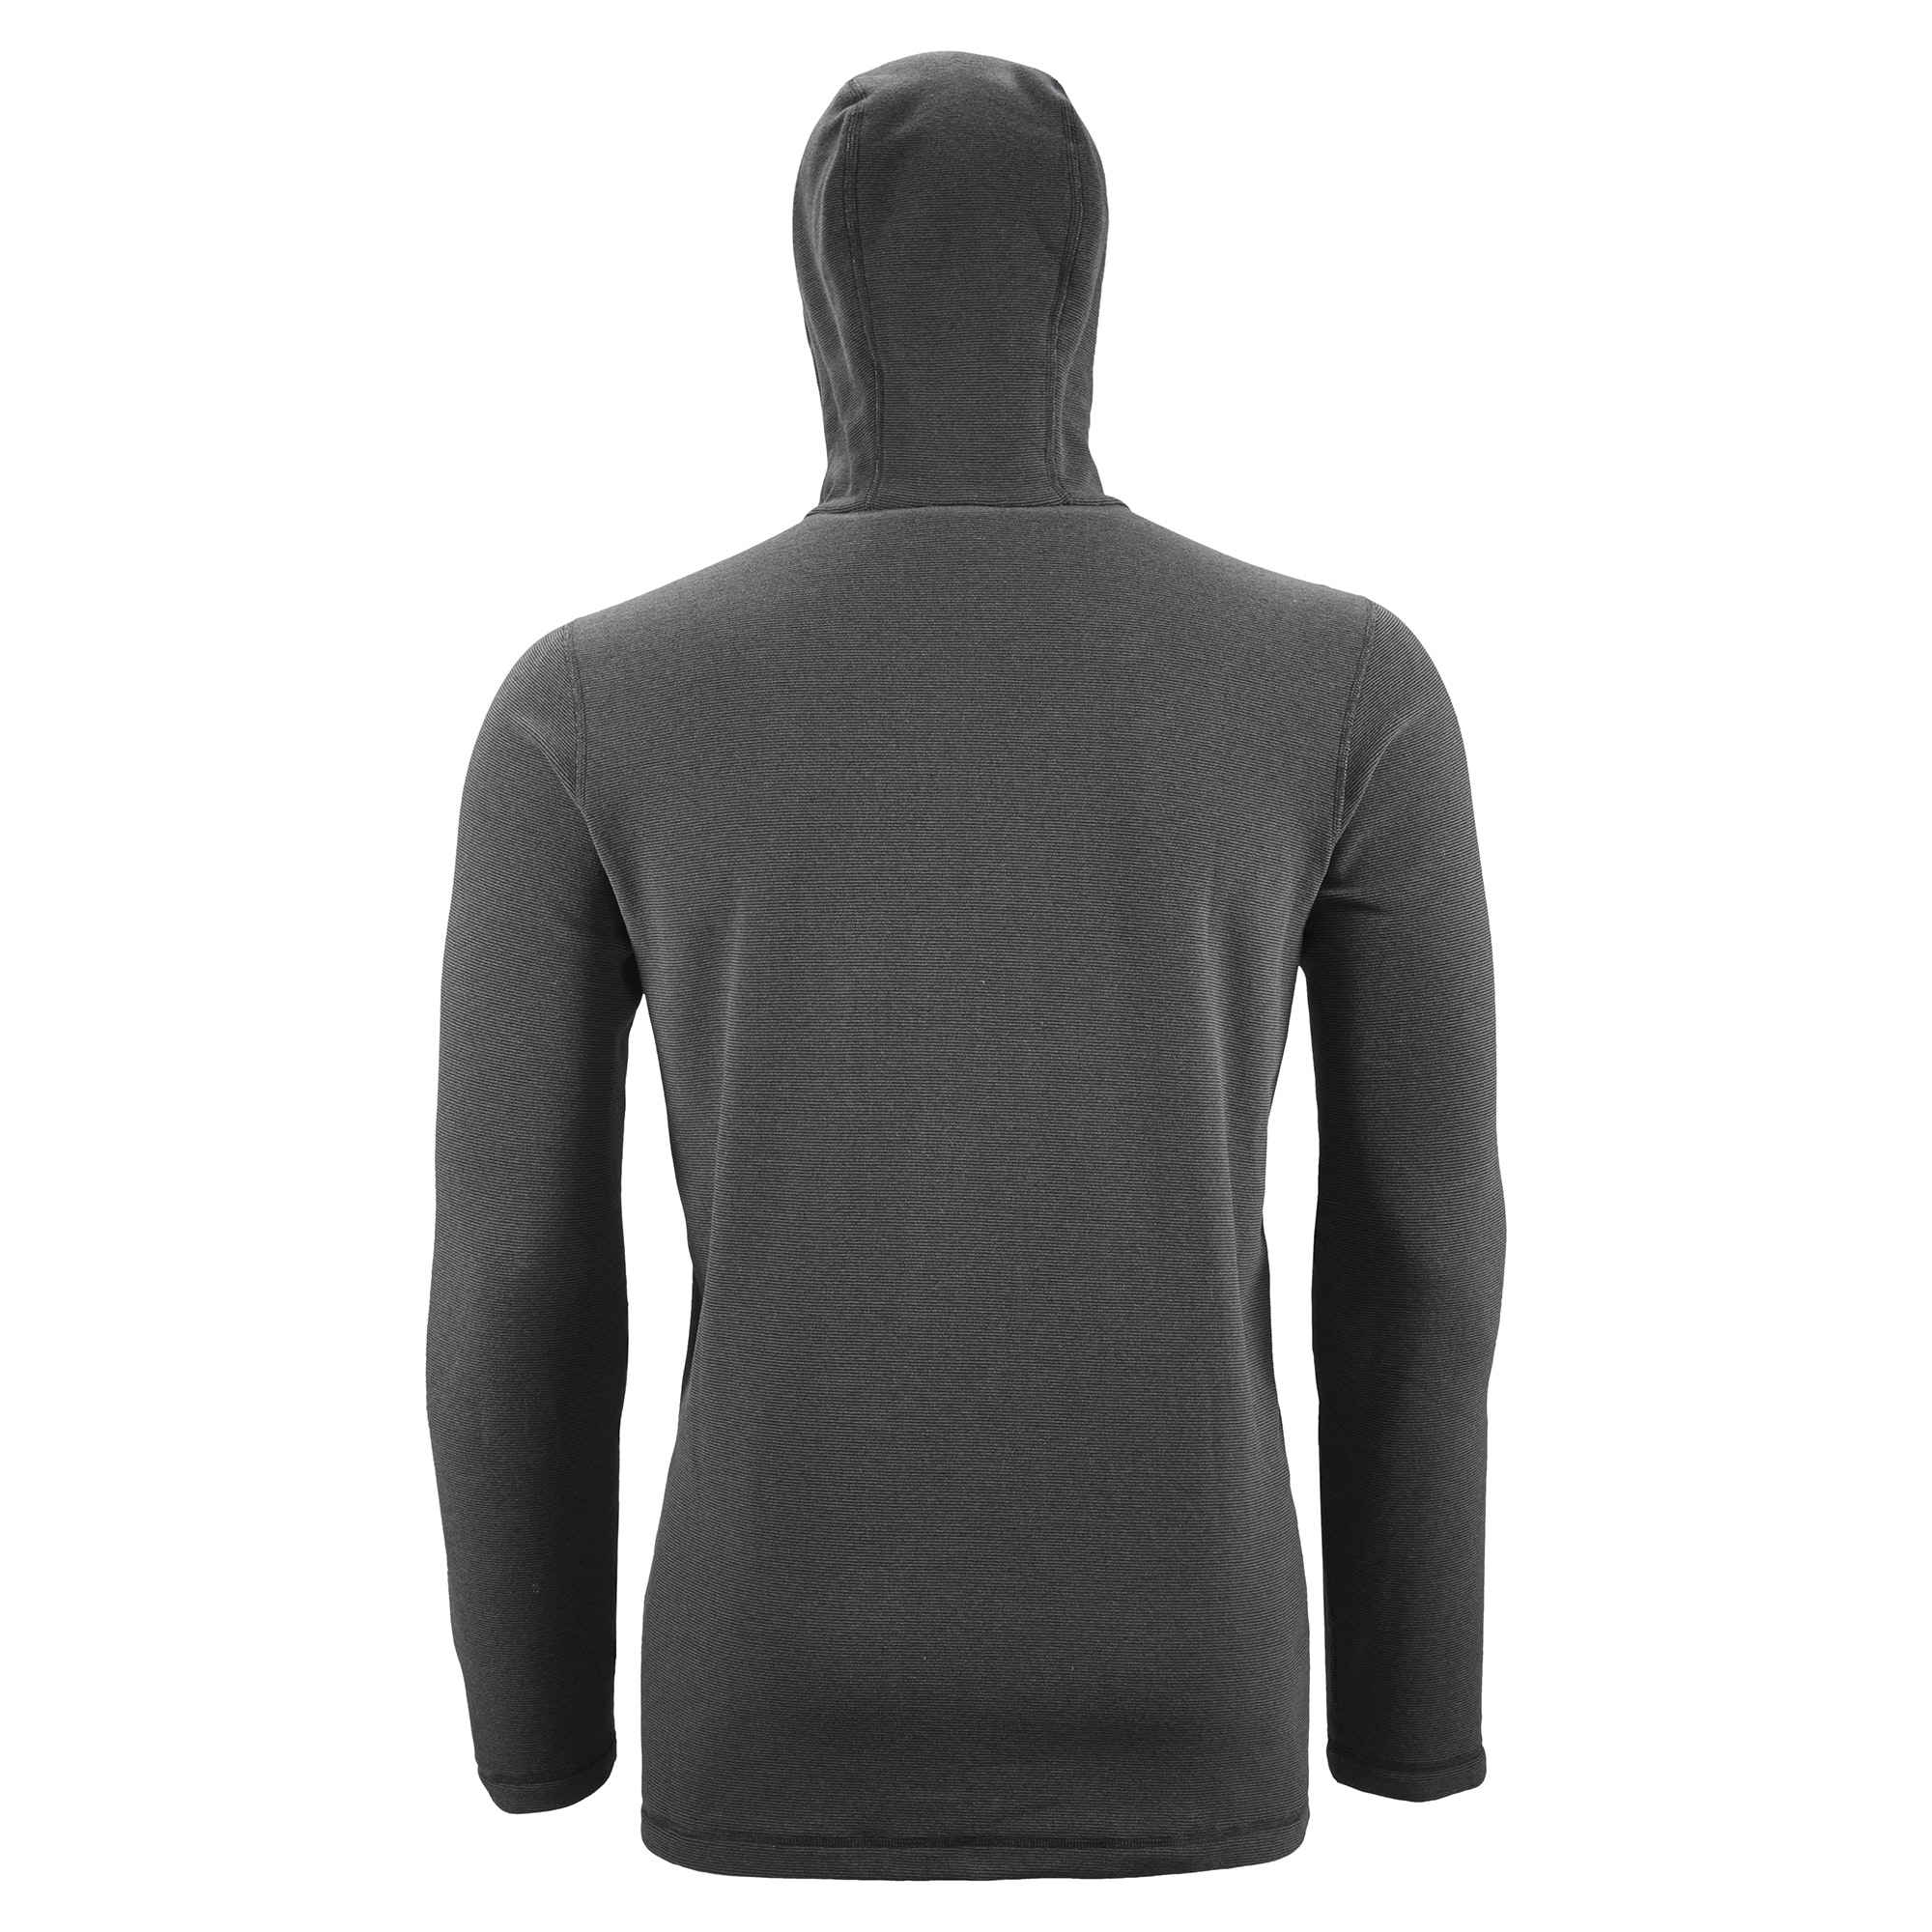 Tauro Men's Hooded Lightweight Fleece Jacket - Dark Blue